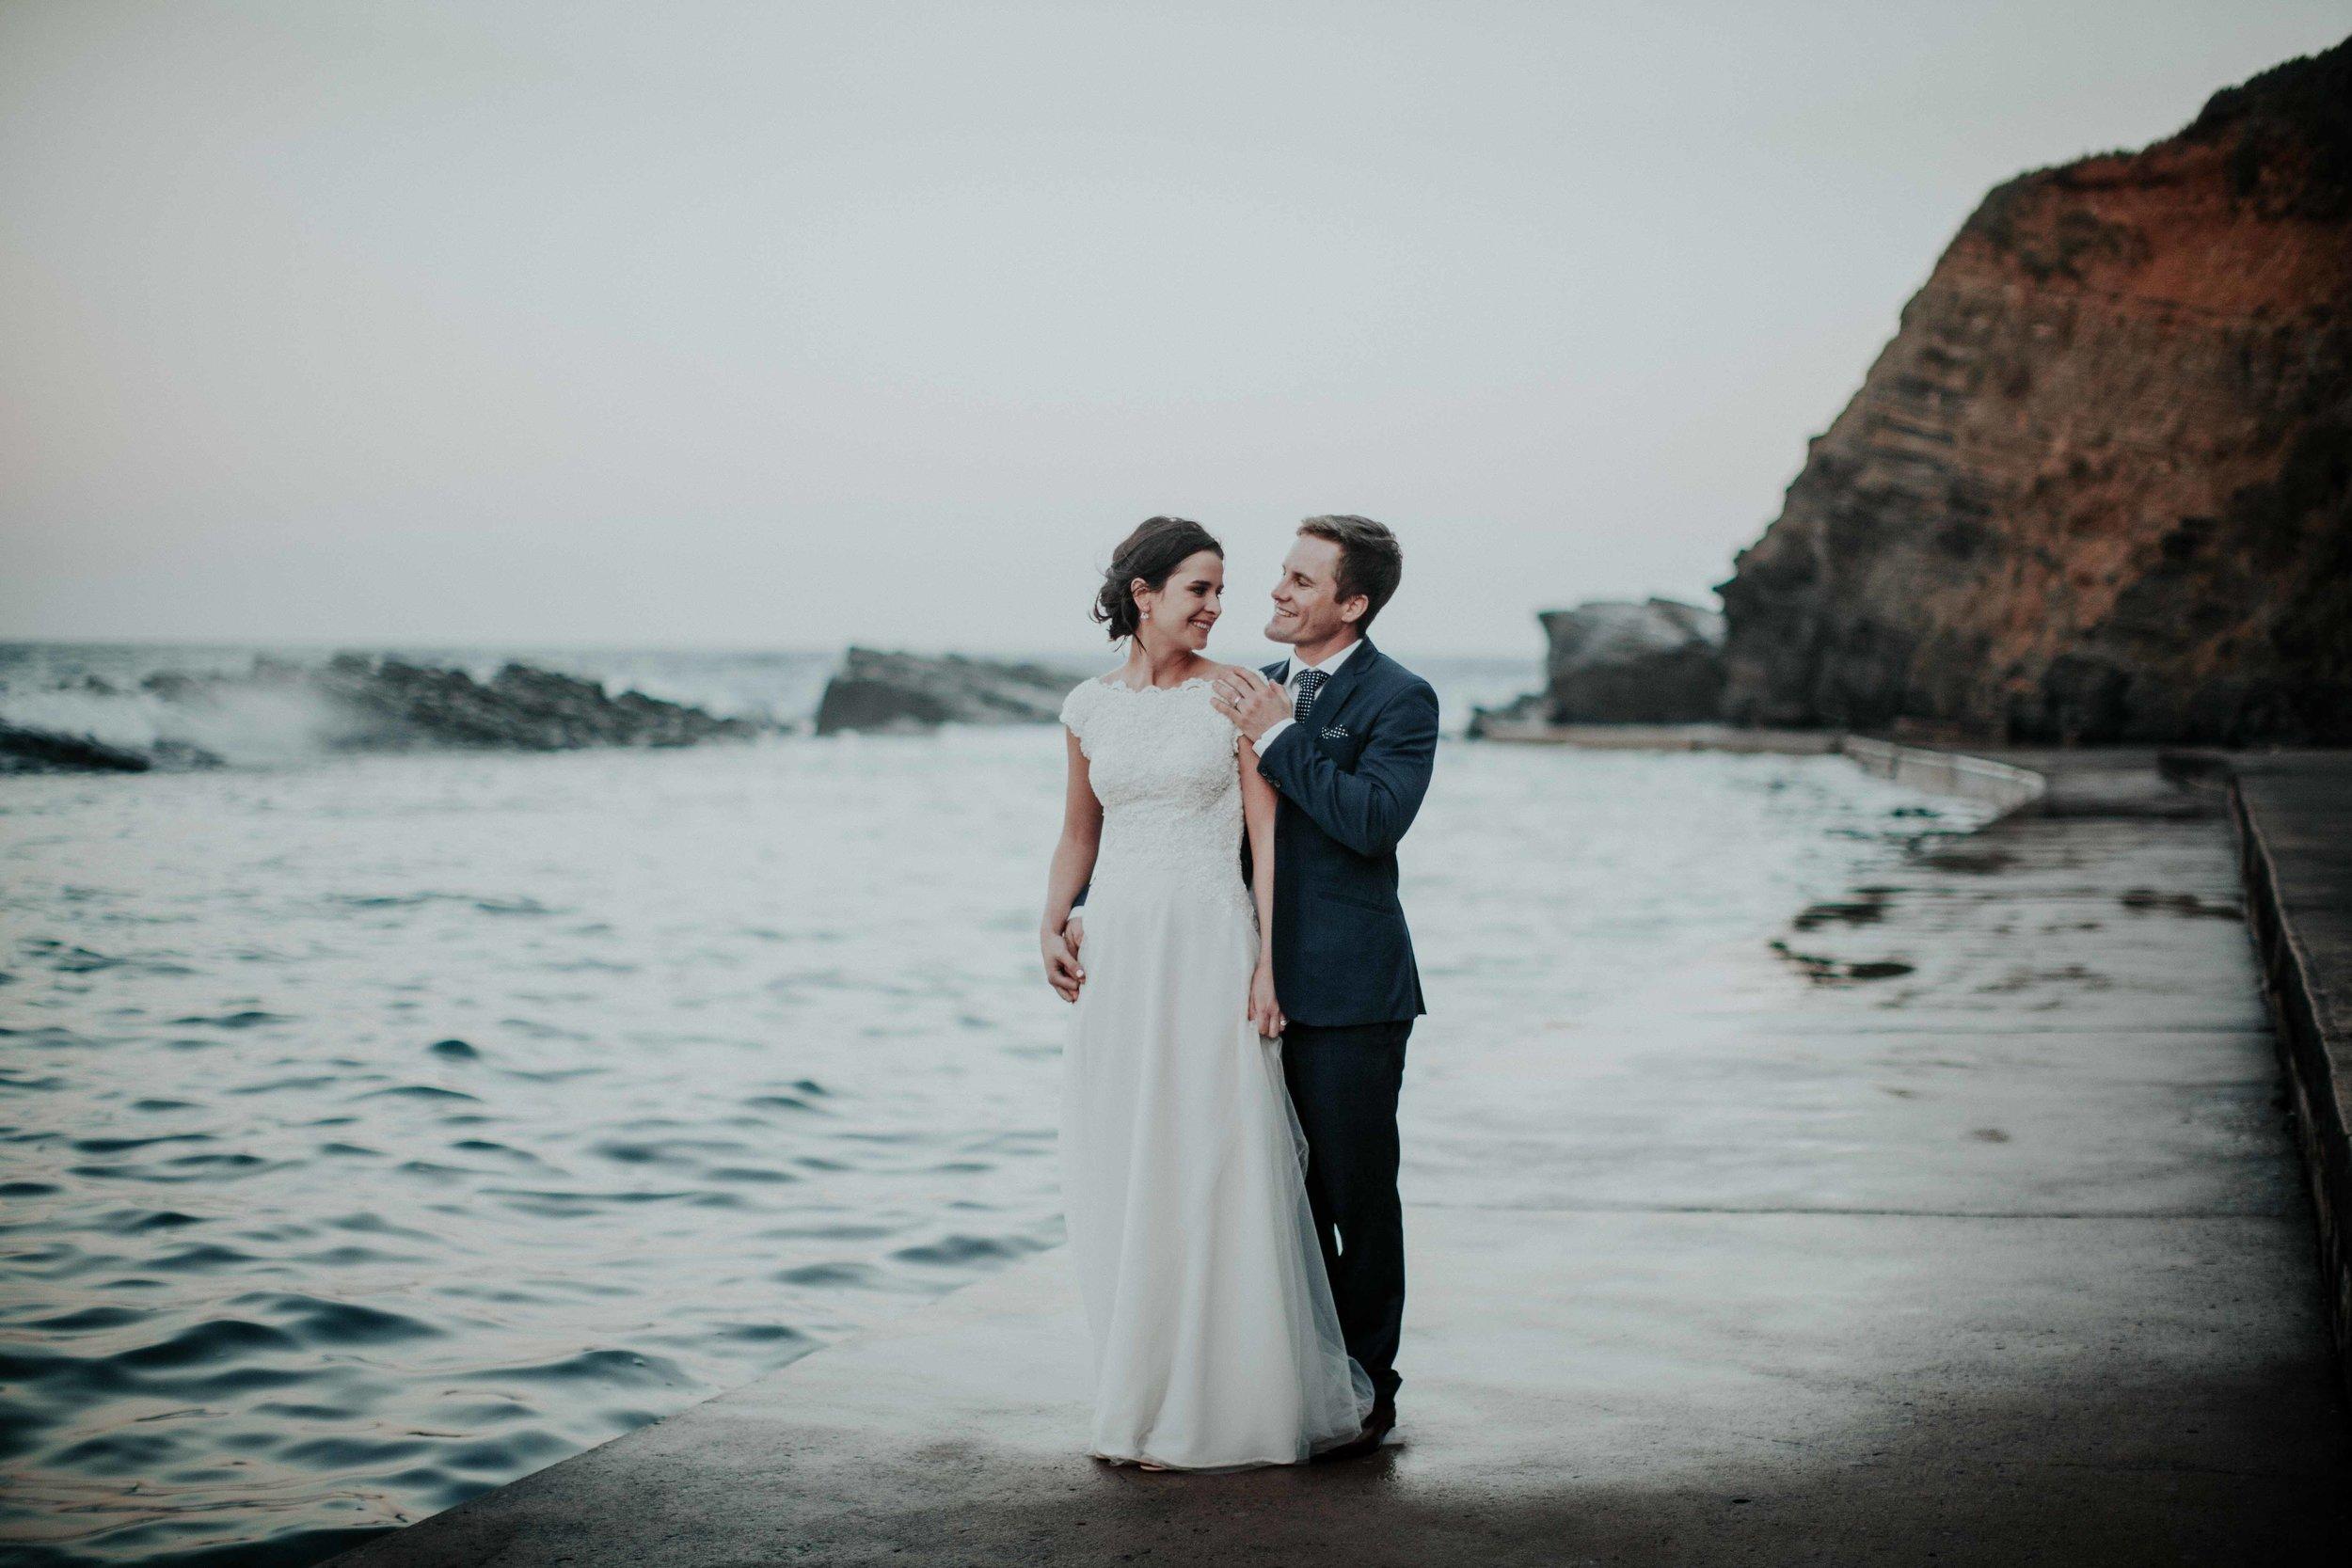 Kristi Smith Photography_Jimmy&Sinead_ Wedding Photographer 19.jpg